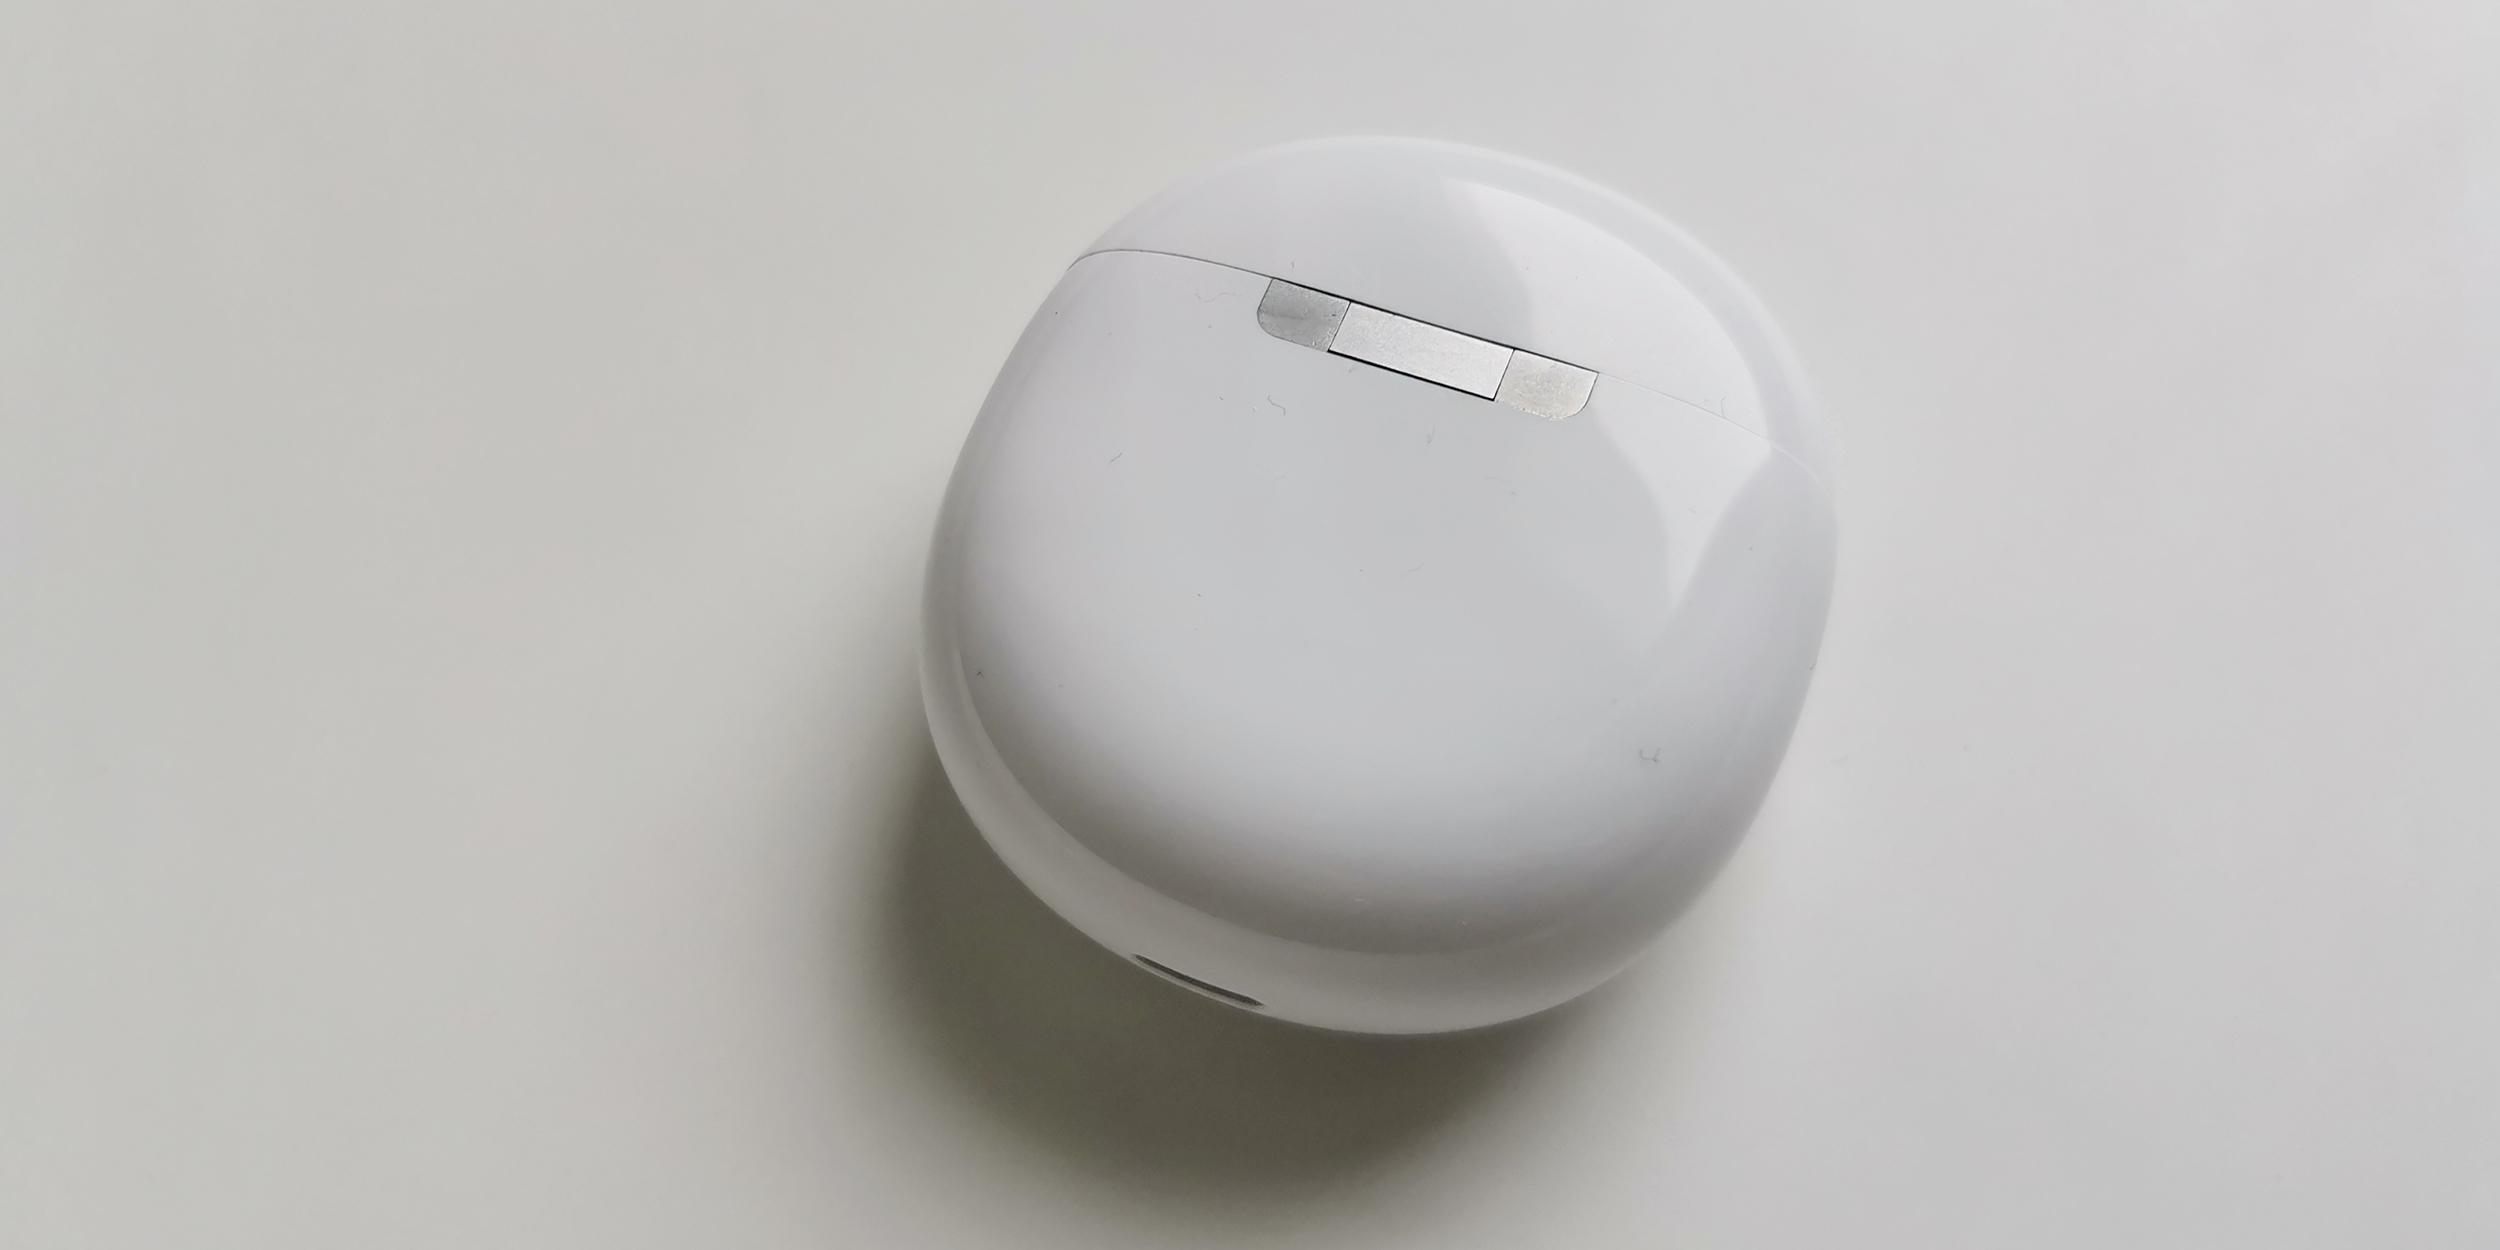 Обзор Realme Buds Air Pro: шарнир футляра